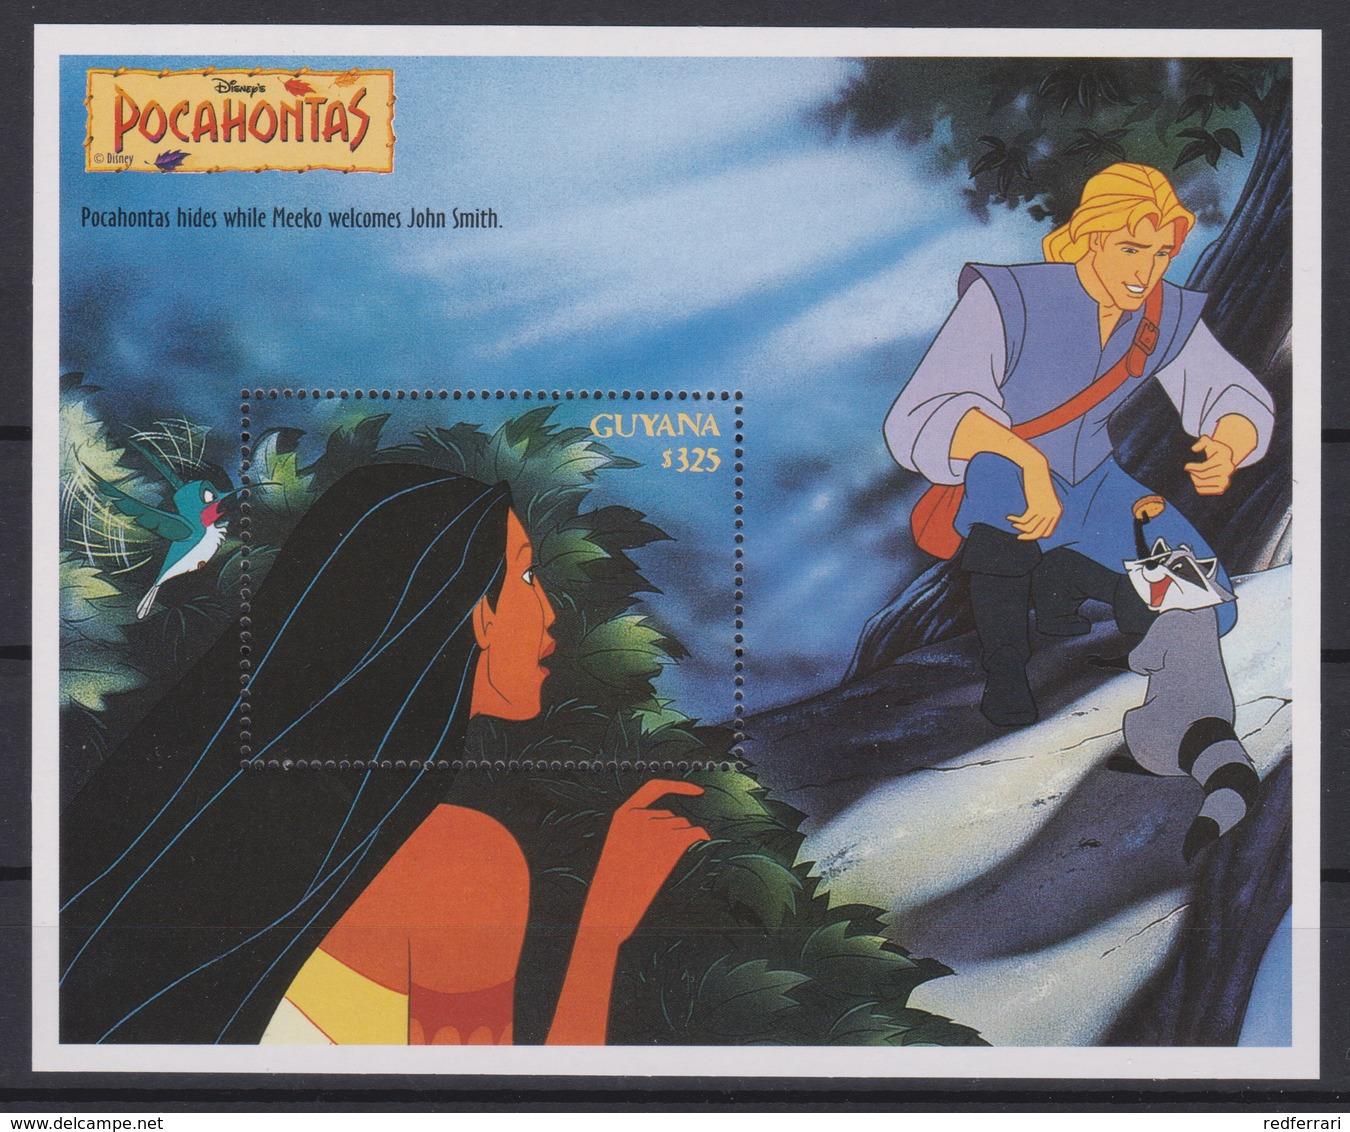 2325  WALT DISNEY - GUYANA ( POCAHONTAS) Presentation Of The Cartoon Characters - Meeko Welcomes John Smith . - Disney